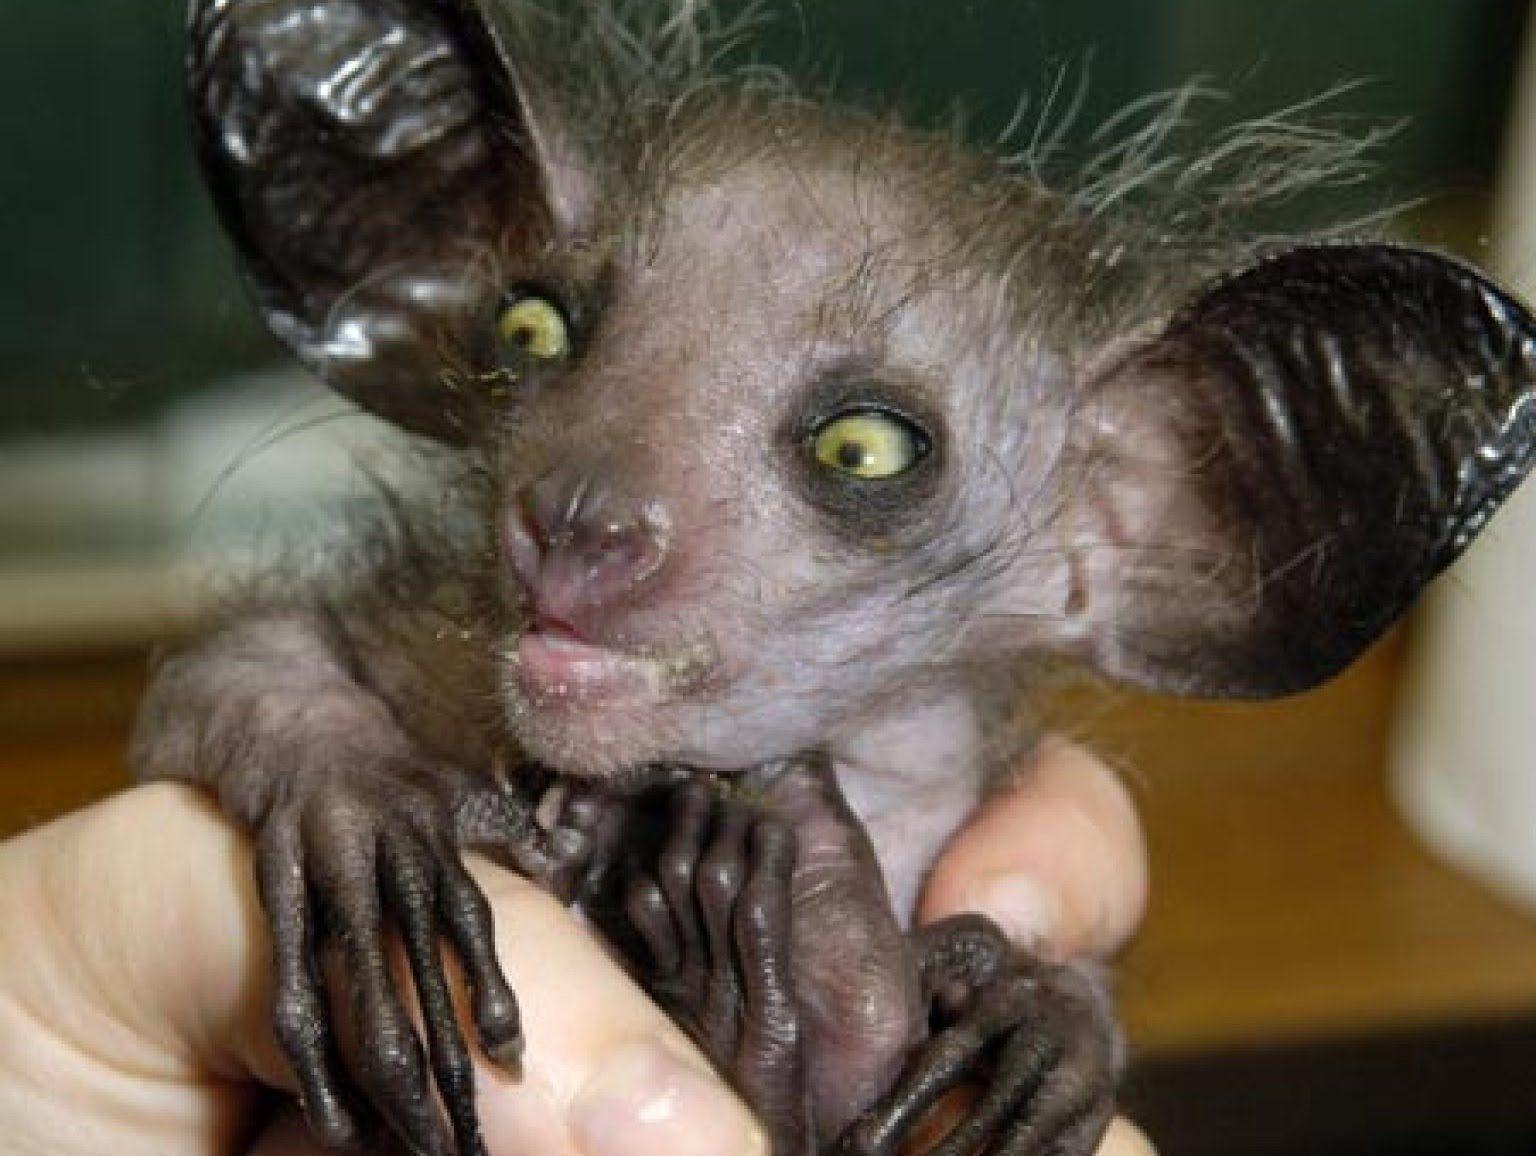 World's Creepiest Animal - The Aye Aye | Scary animals, Weird looking  animals, Creepy animals